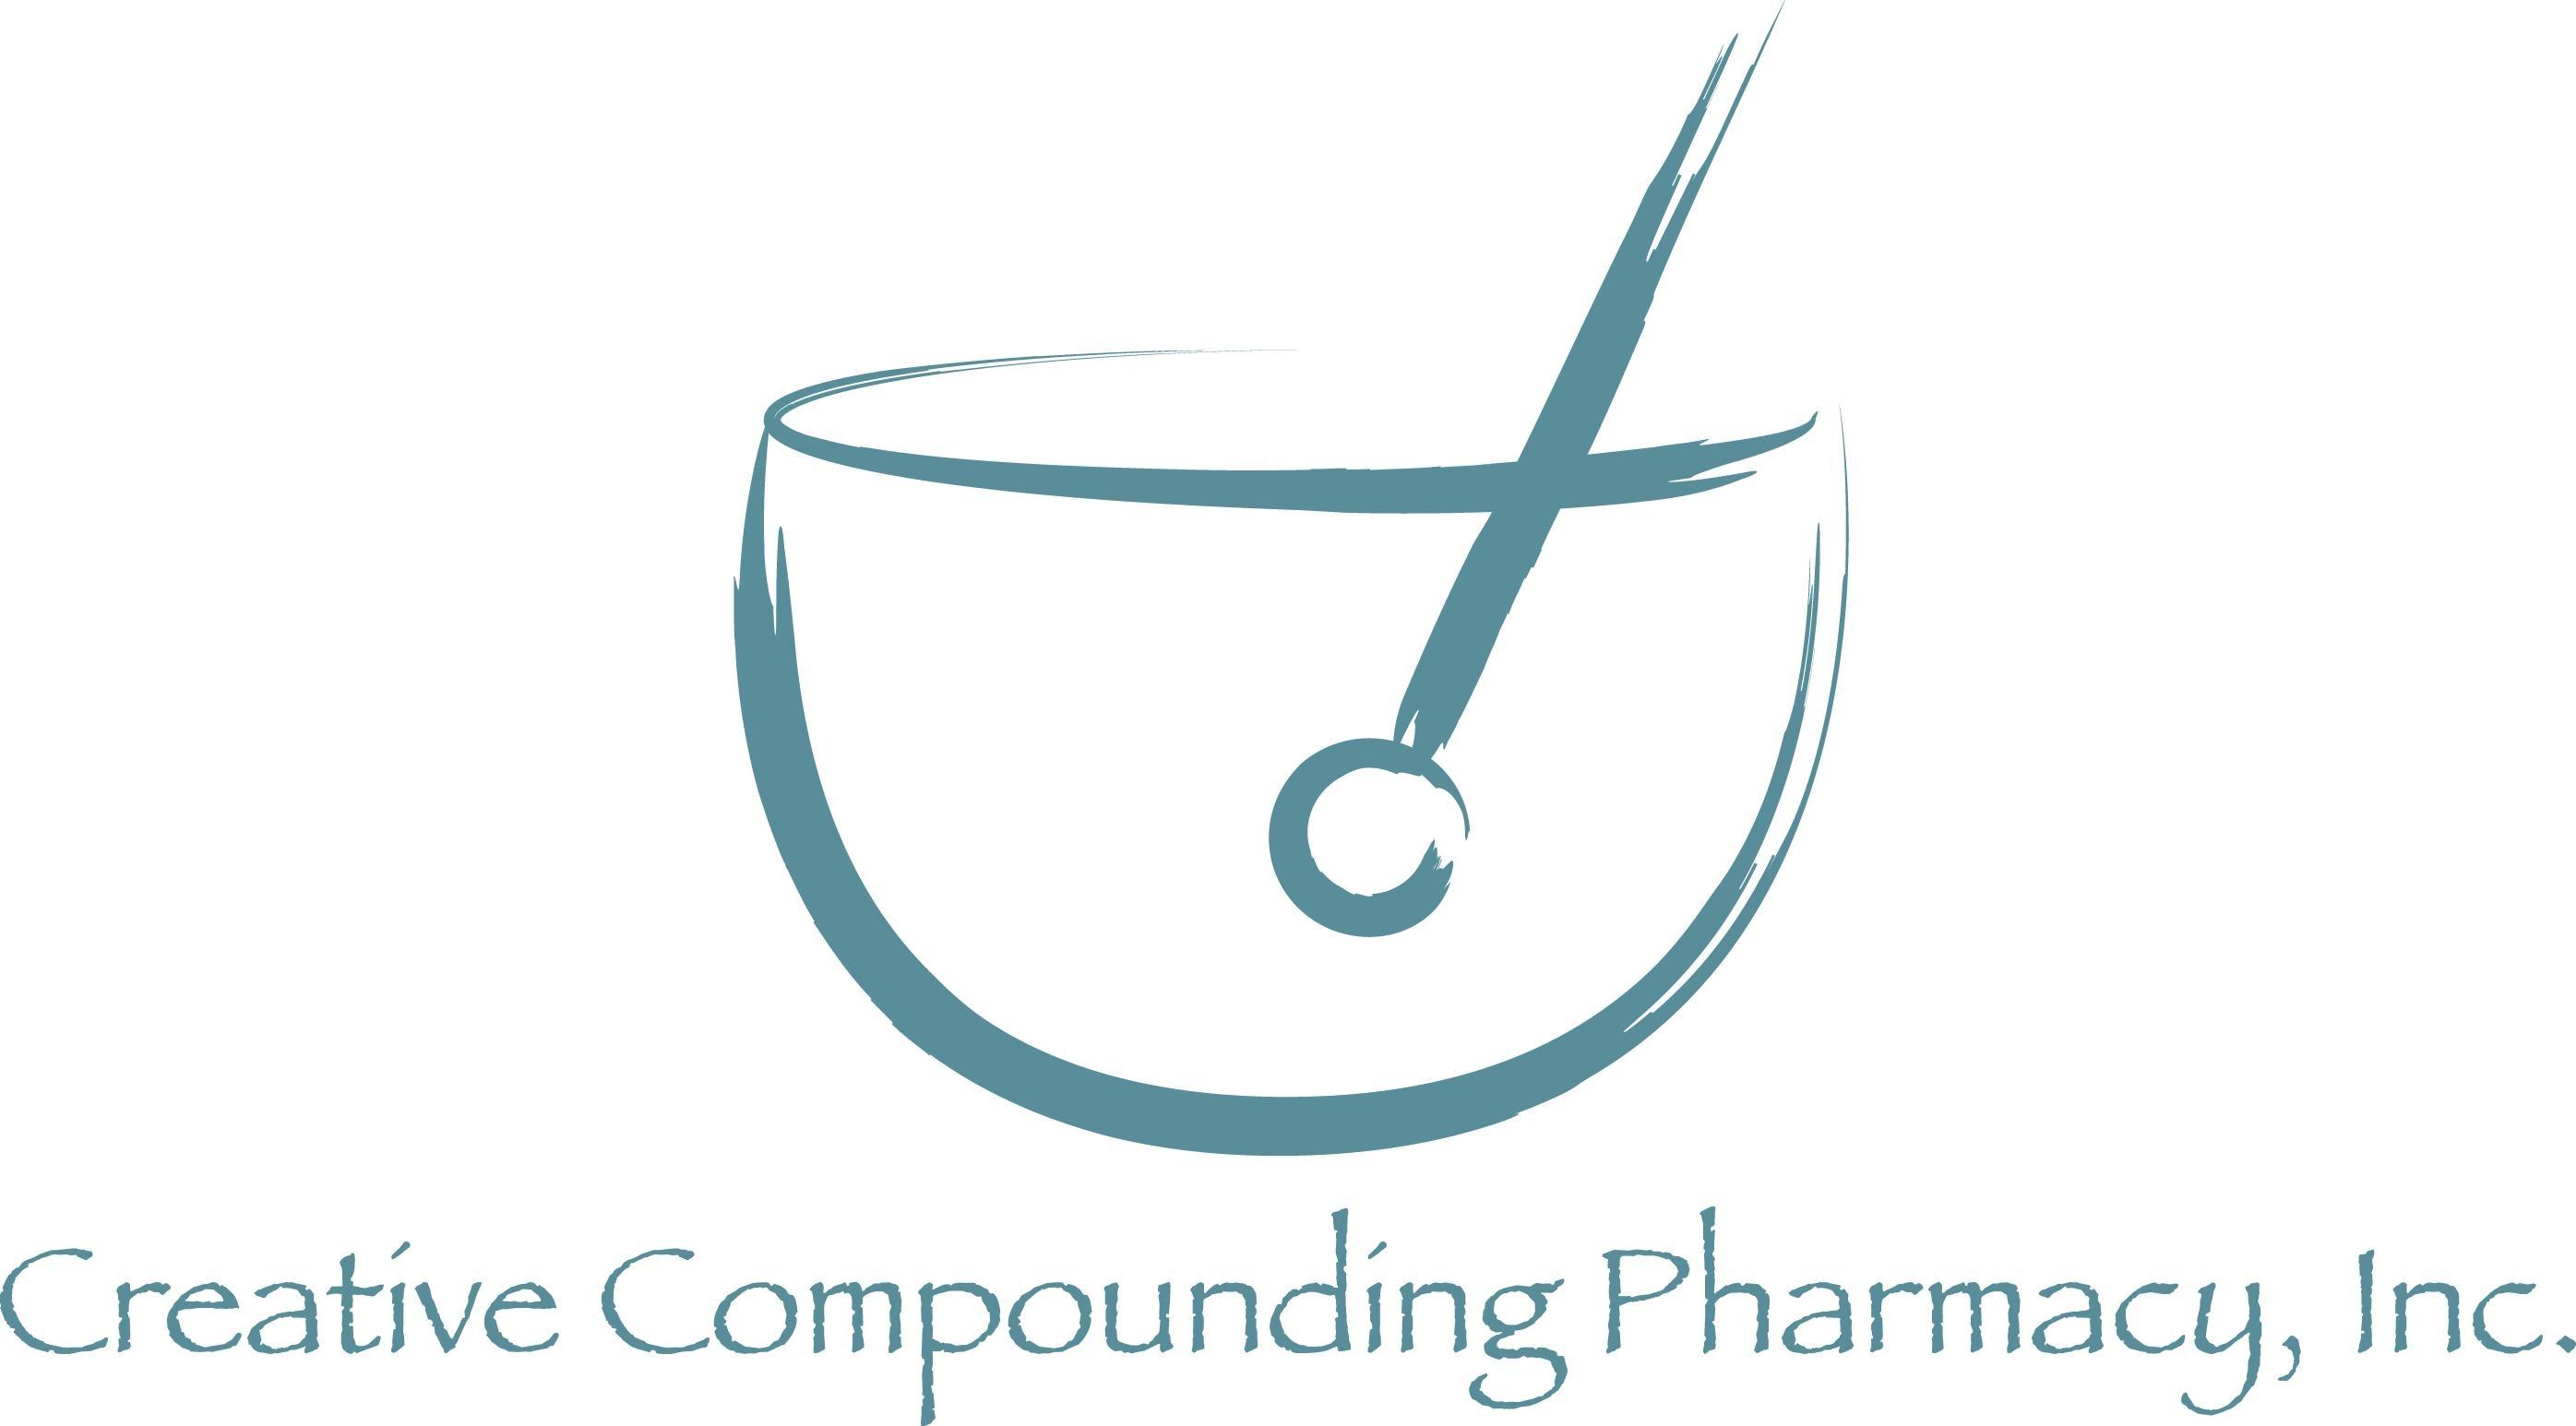 Creative Compounding Pharmacy, Inc. - Tustin, CA - Pharmacist